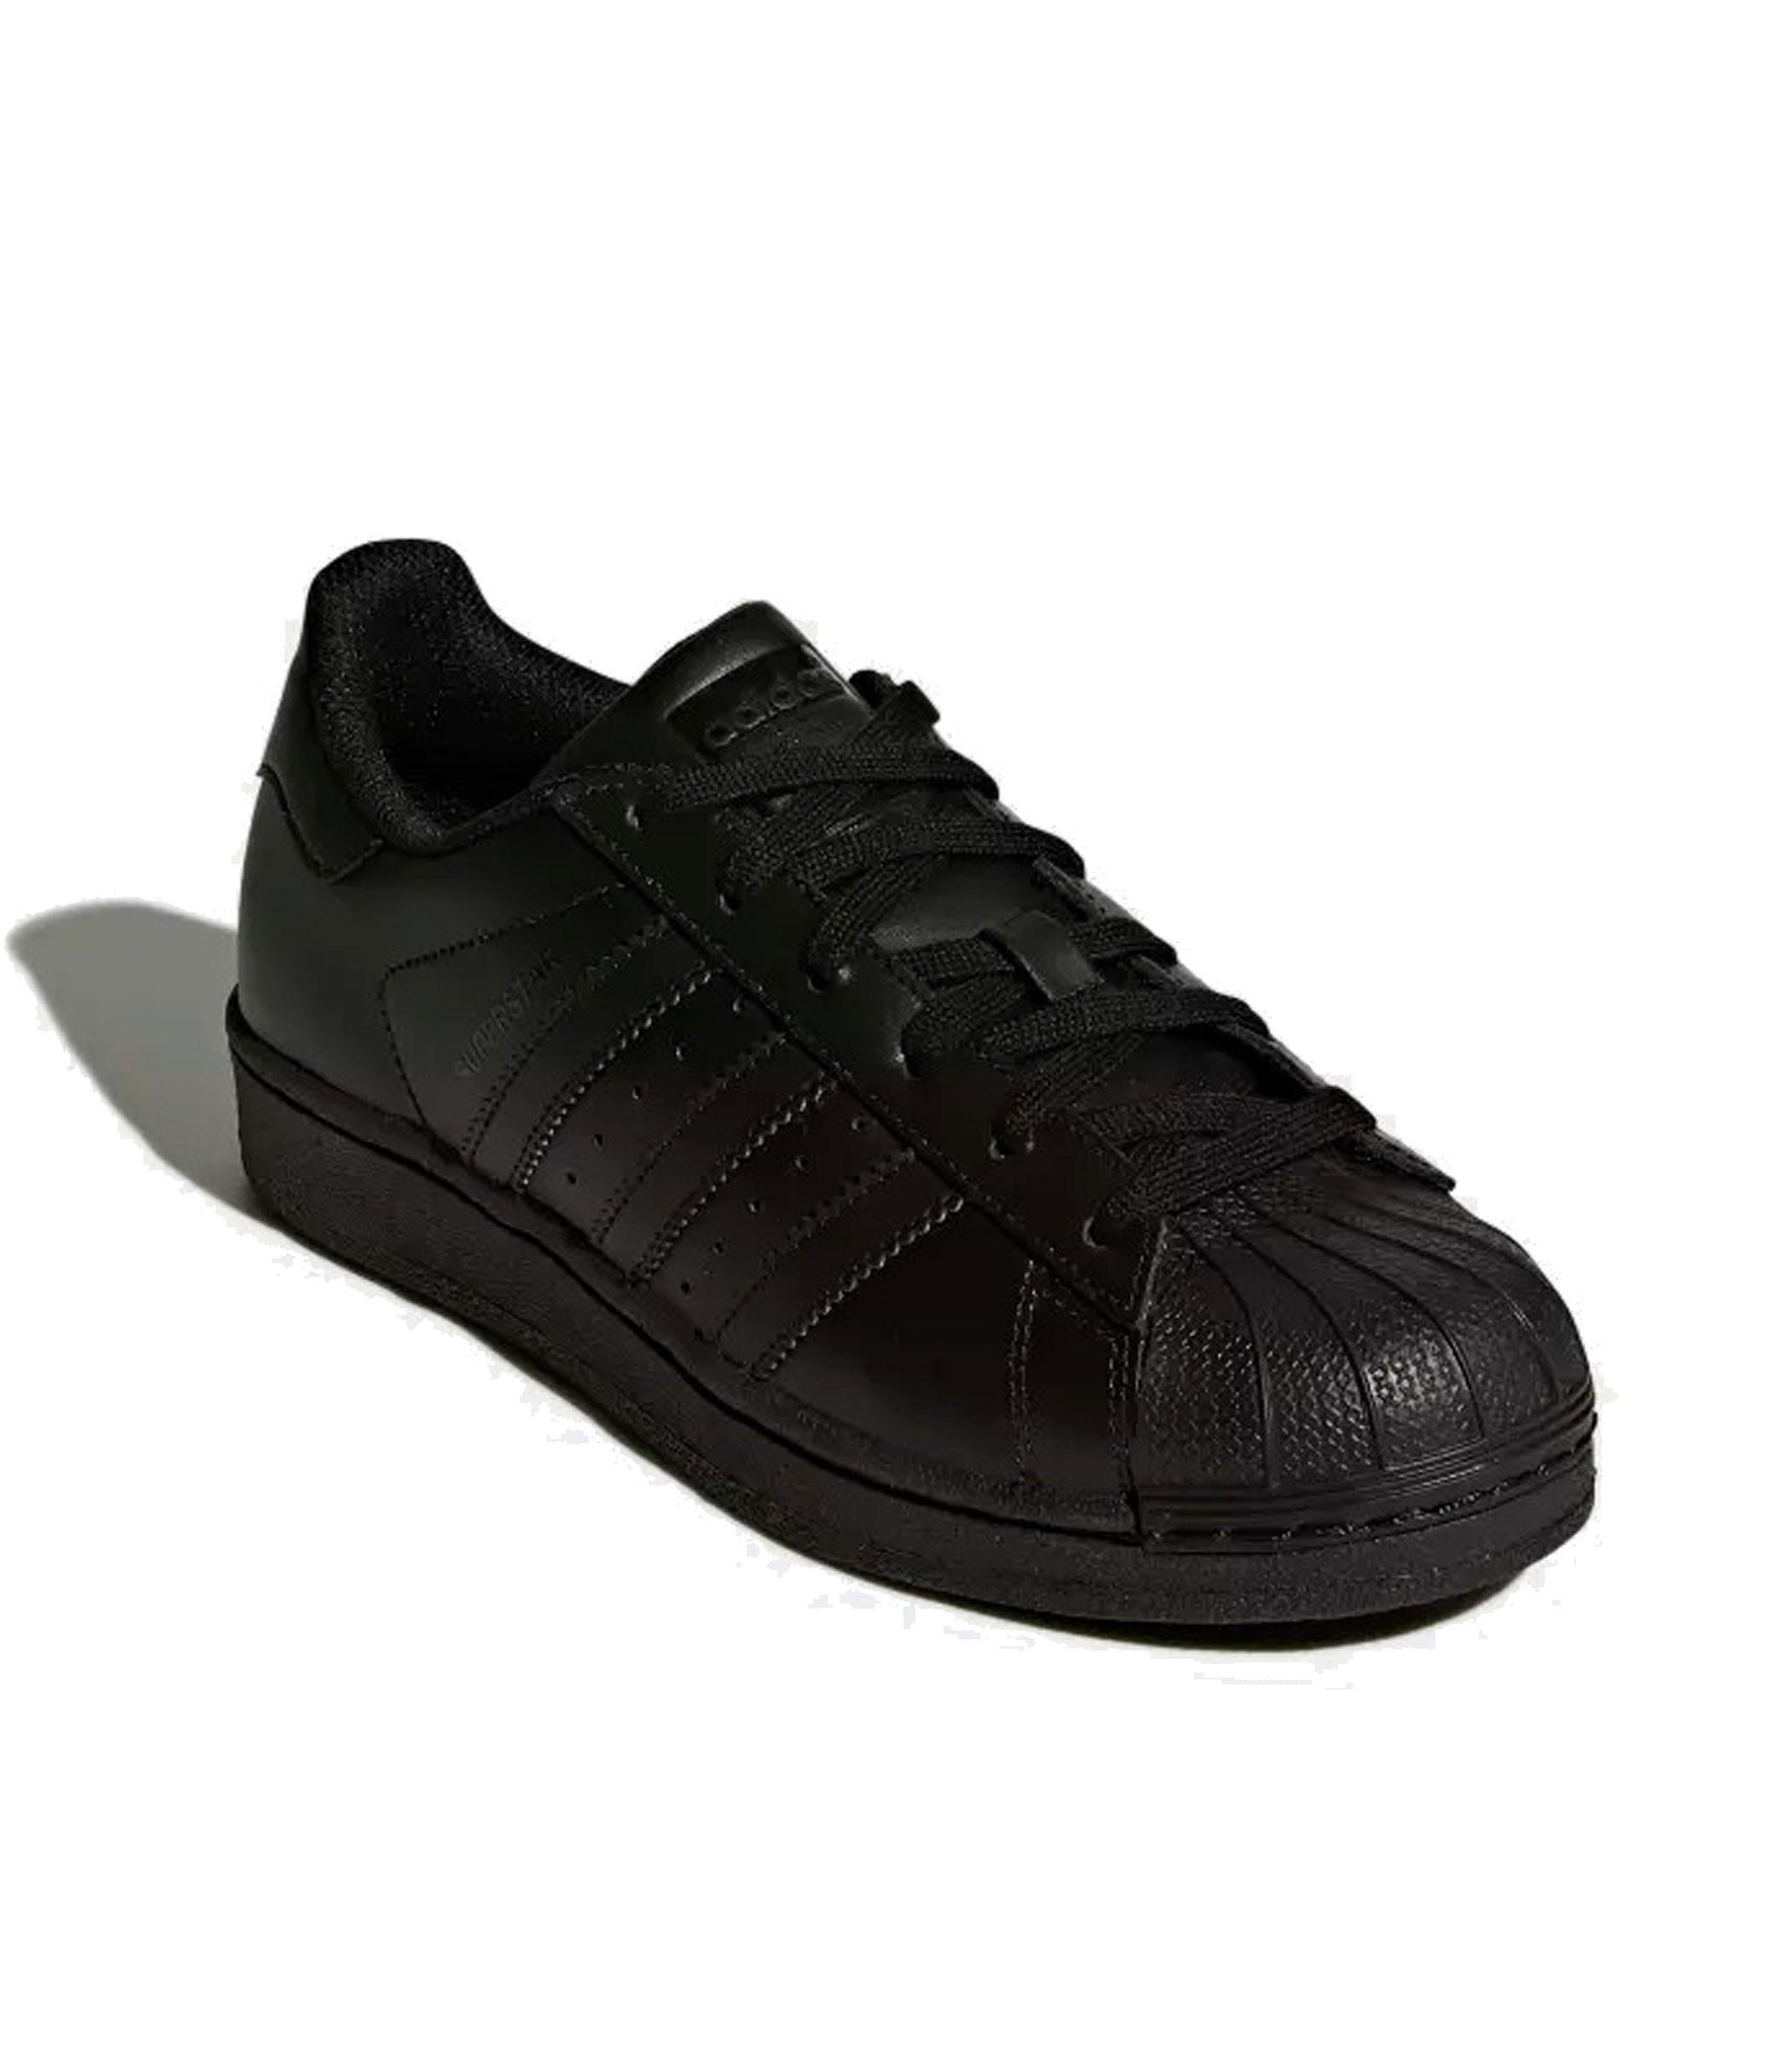 B25724 Scarpe Sneakers Adidas SUPERSTAR FOUNDATION J da ragazzo ragazza rif. 528f6aed065